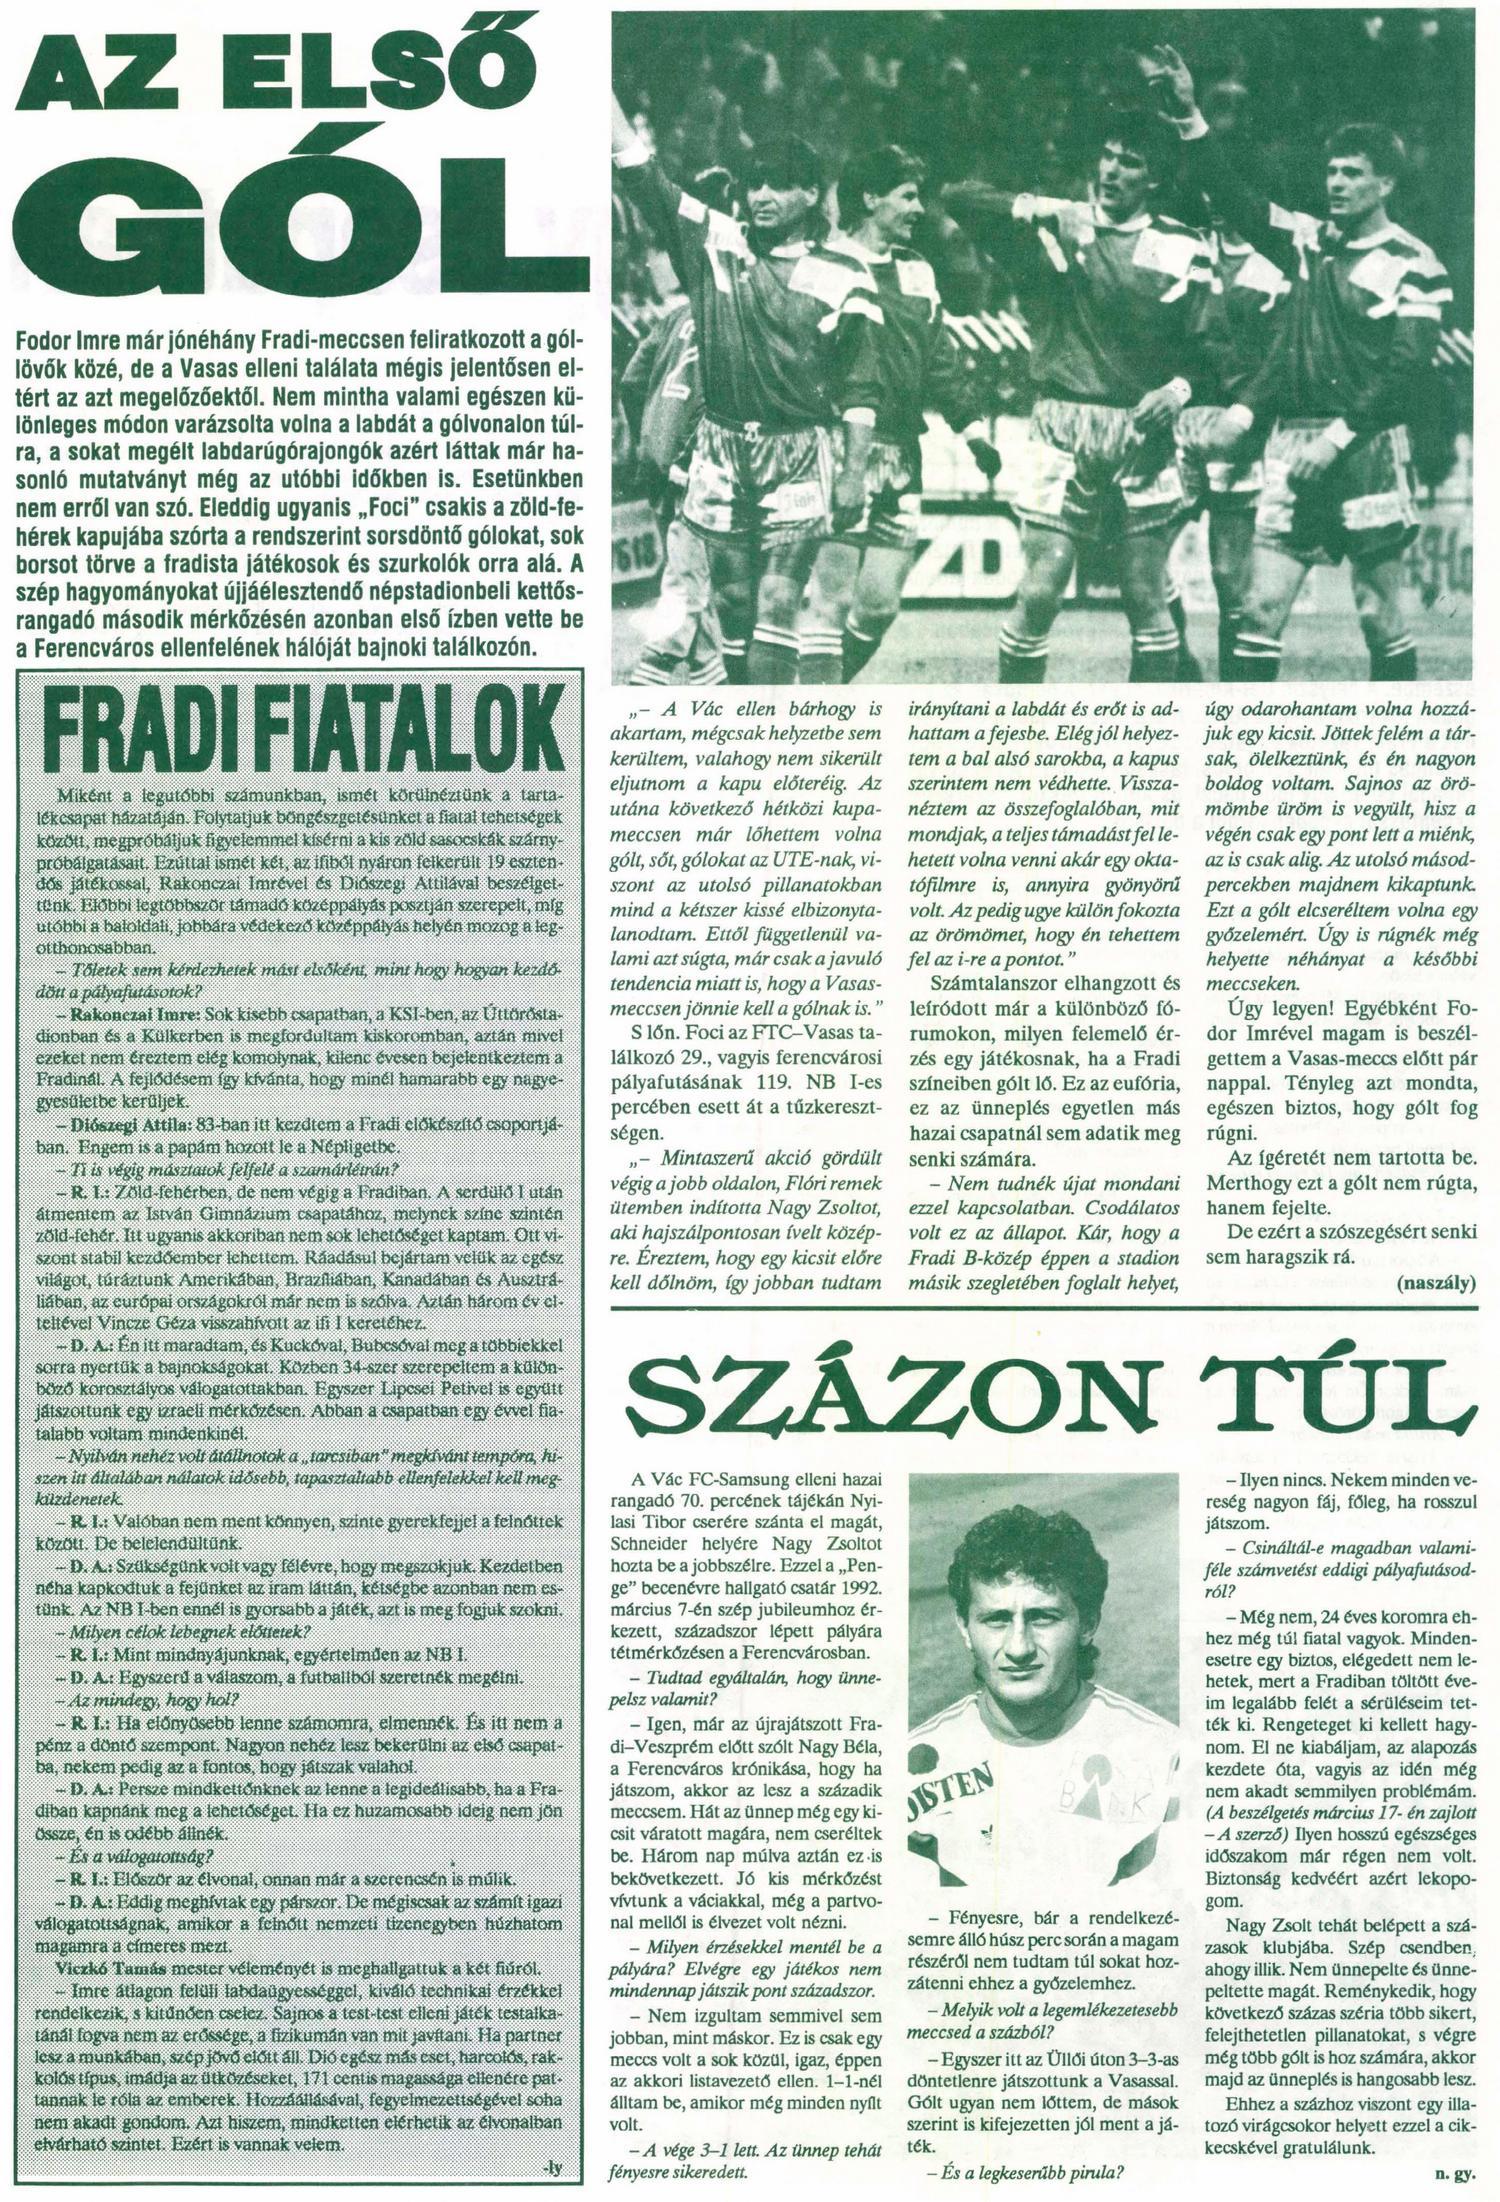 TFU_19920325_FU-Zs_004 -0003